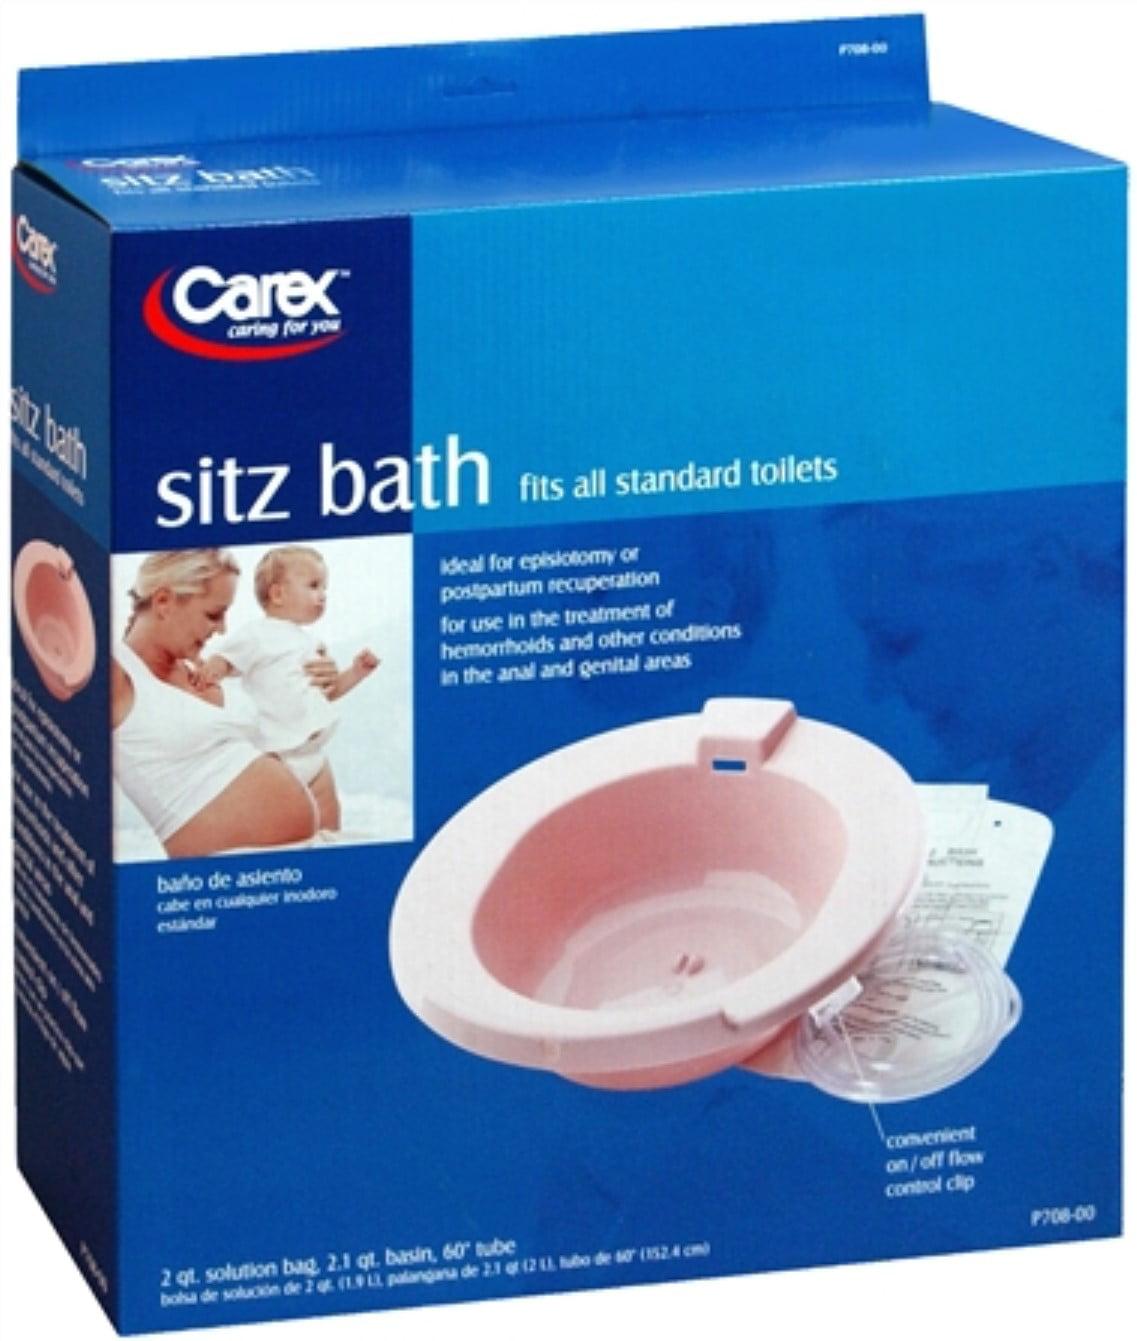 Carex Sitz Bath P708-00 1 Each - Walmart.com